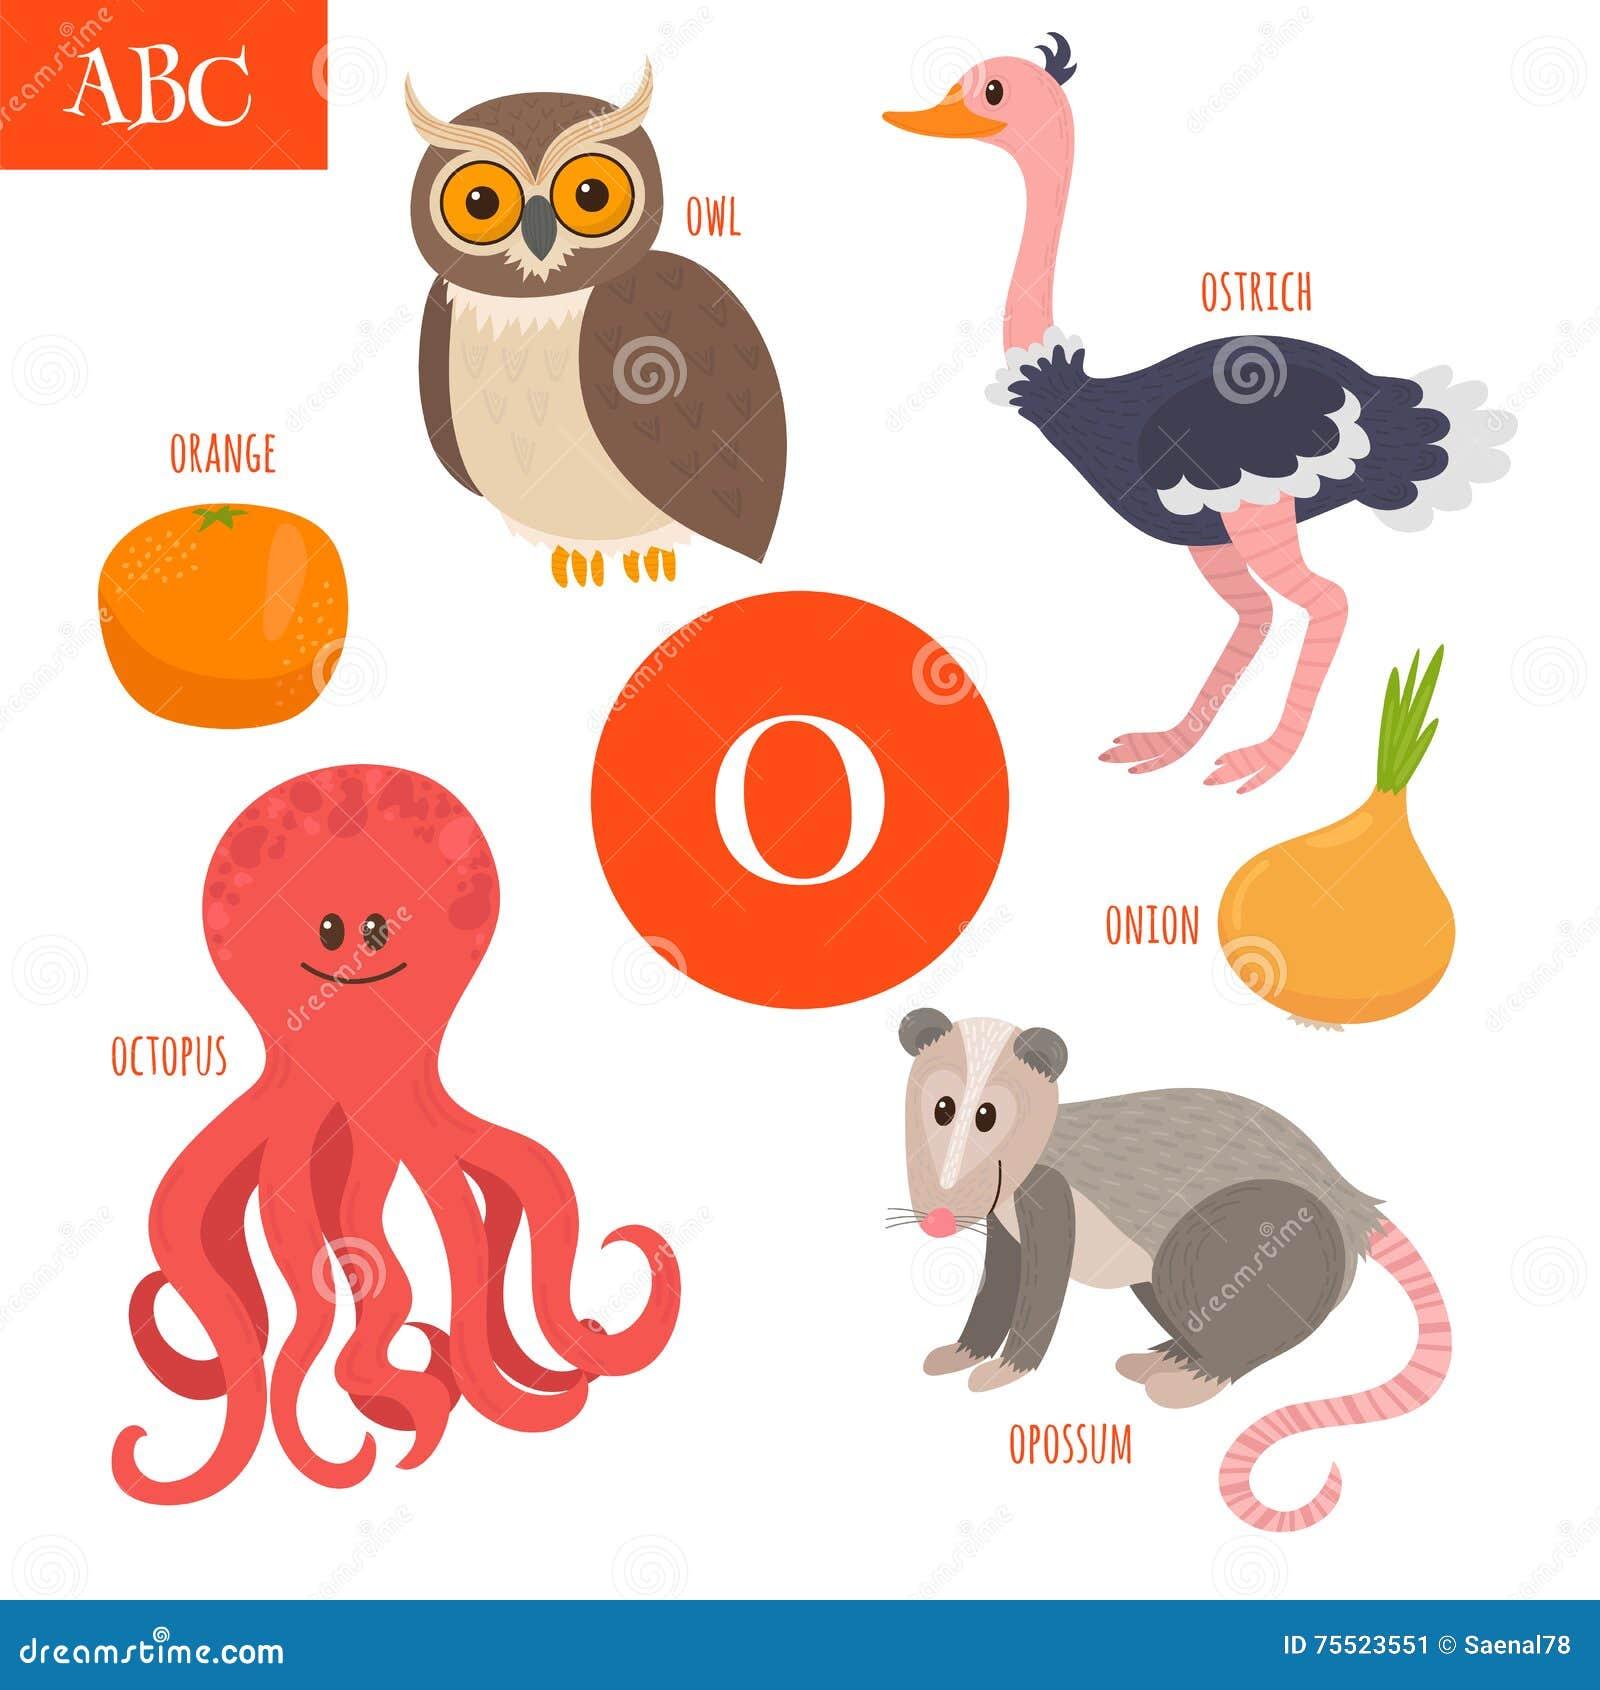 ostrich children stock image cartoondealer com 42176683 Elephant Clip Art Elephant Clip Art